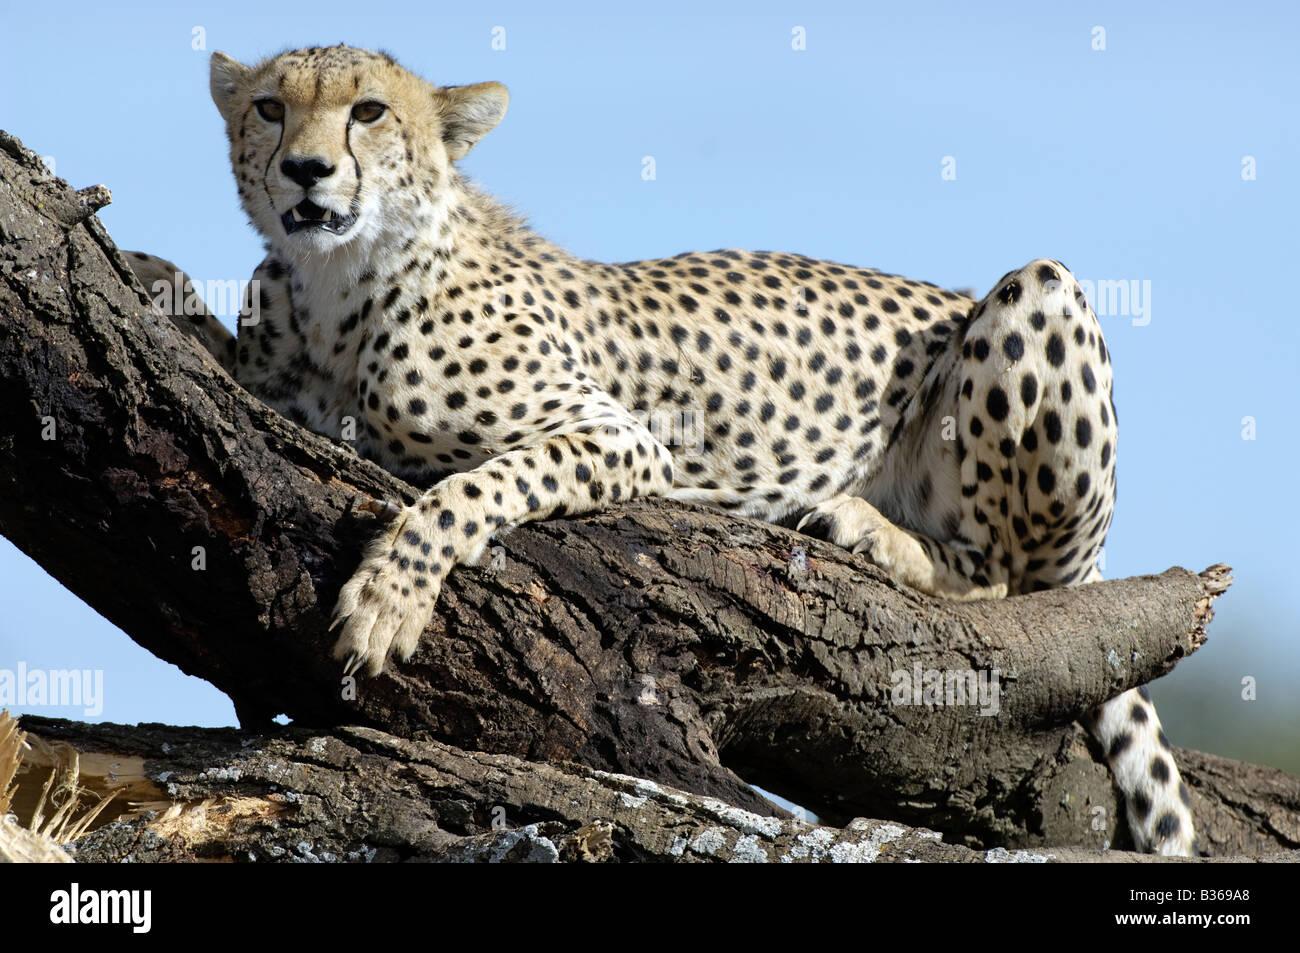 Cheetah using a collapsed tree as a vantage point to look for prey (Acinonyx jubatus) Ndutu, Ngorongoro, Tanzania - Stock Image